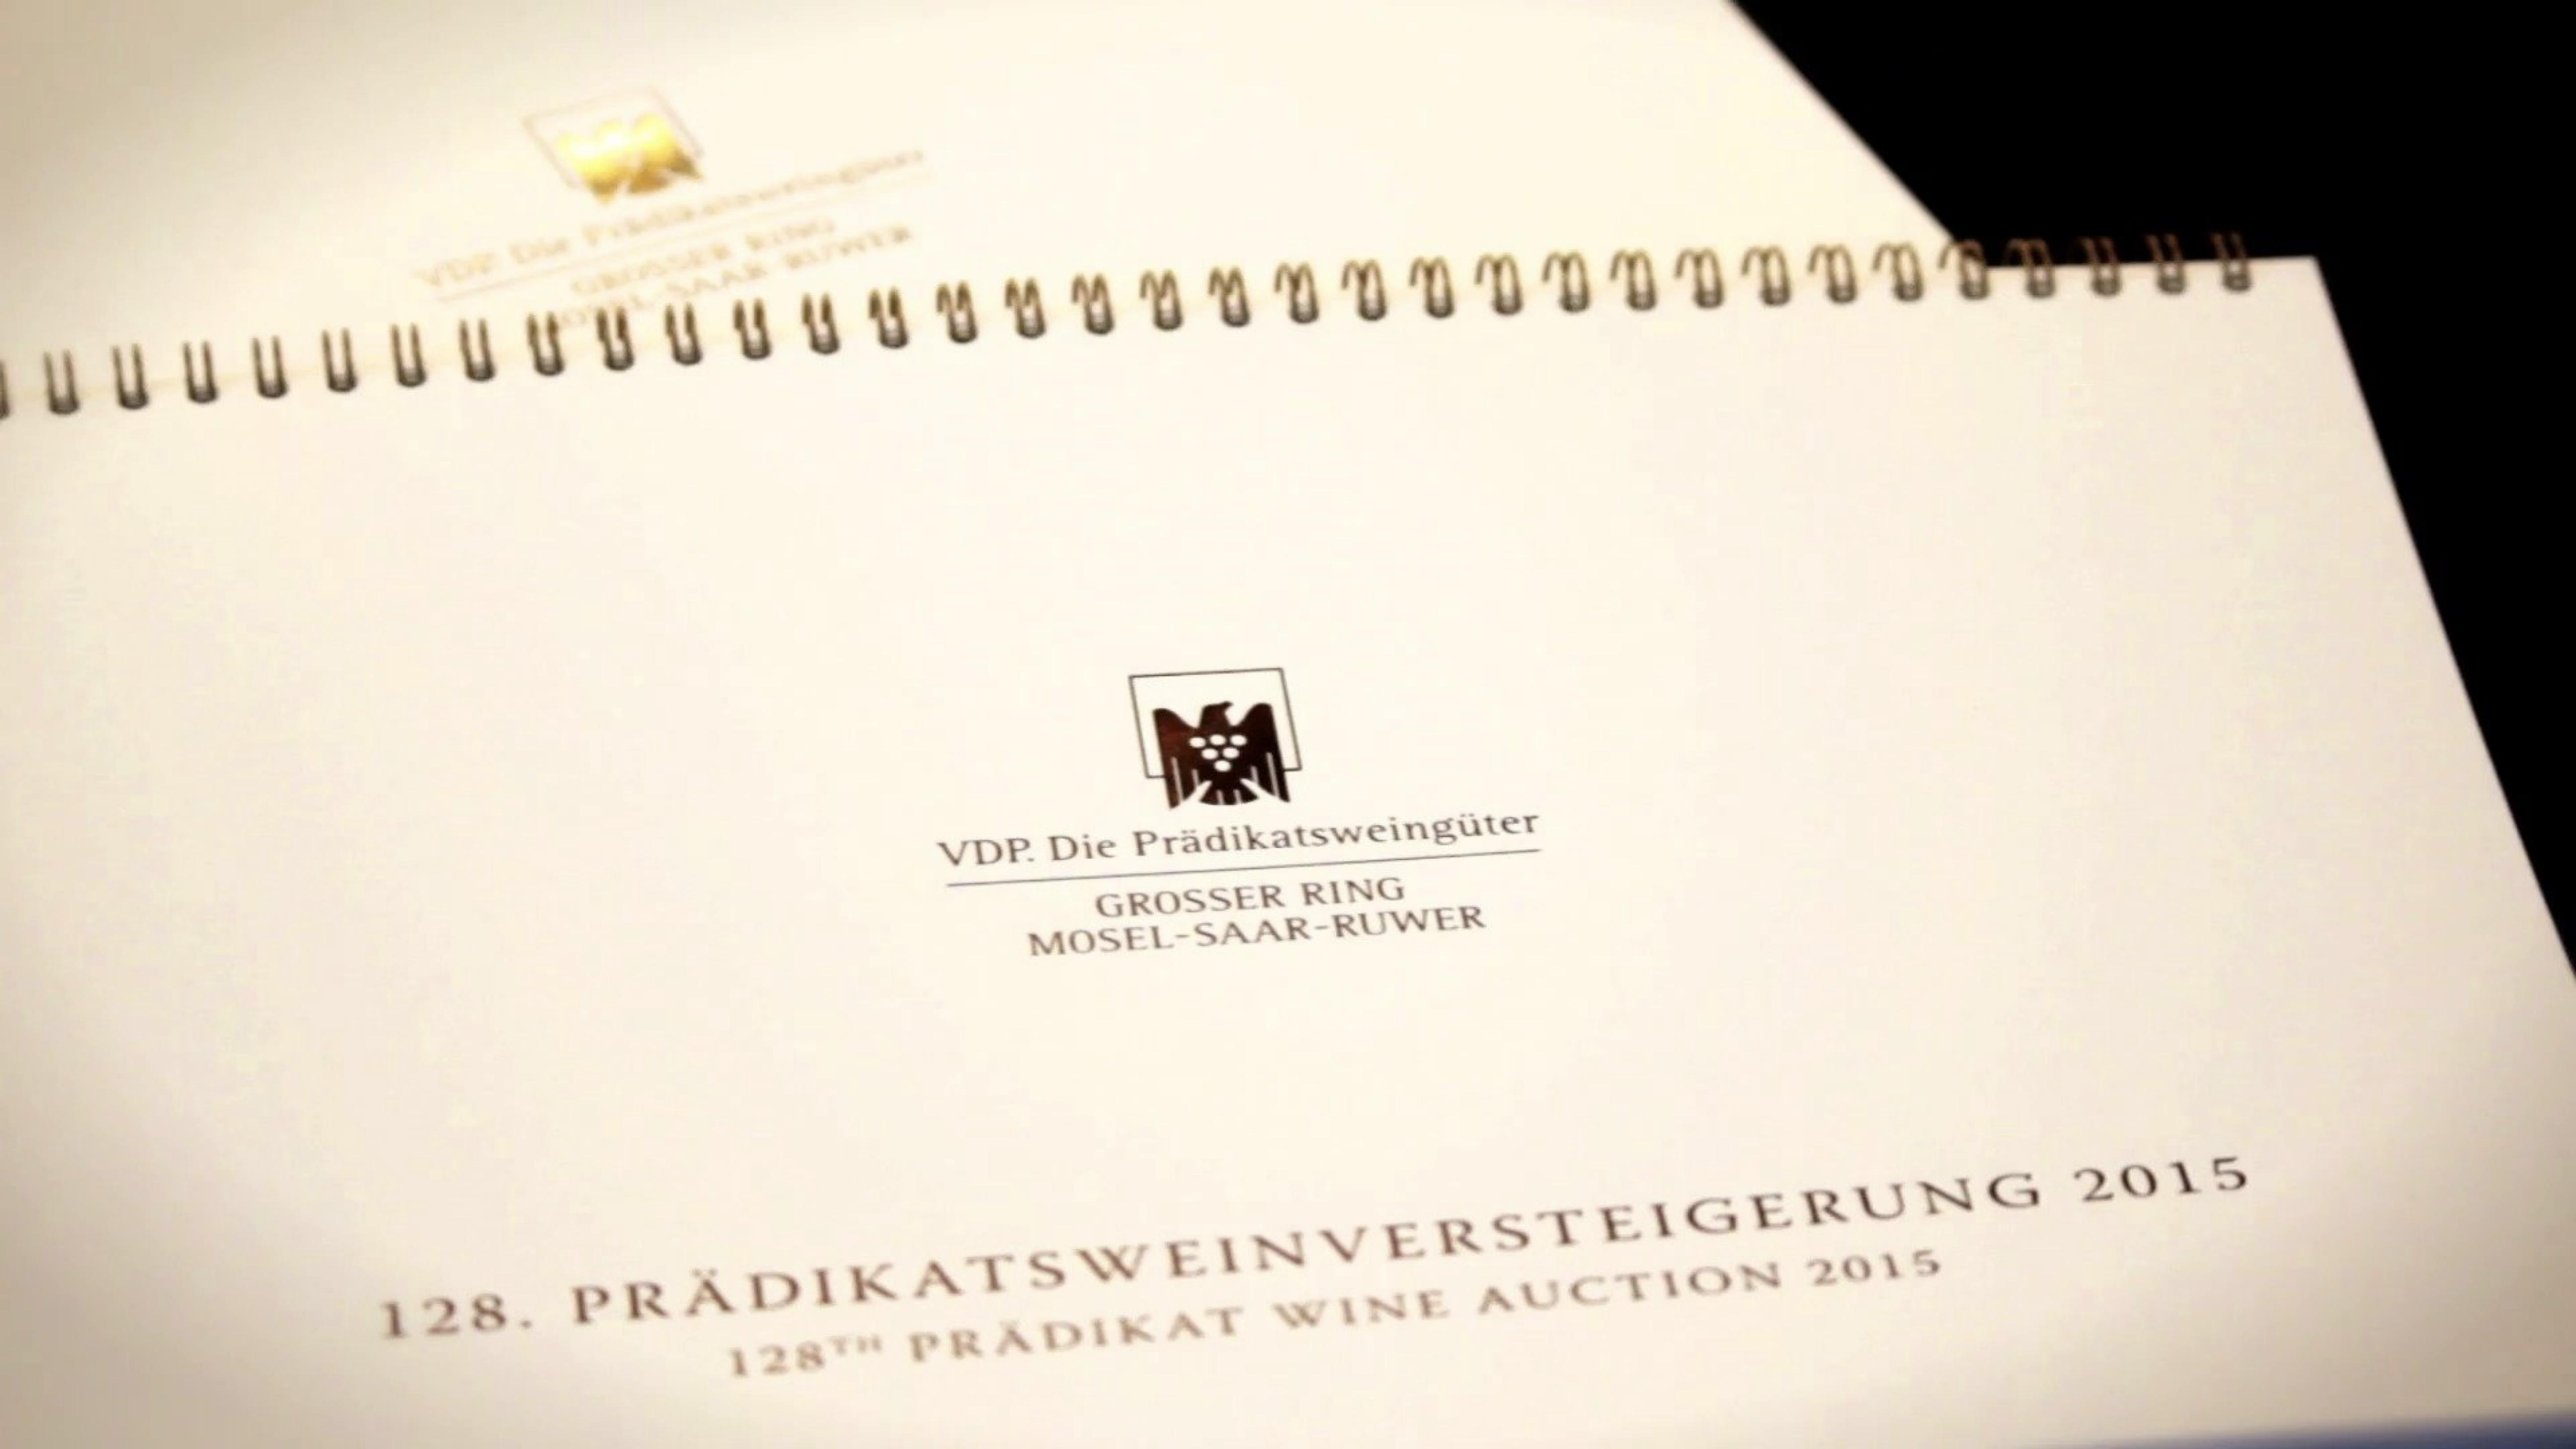 128th predicate wine auction 2015